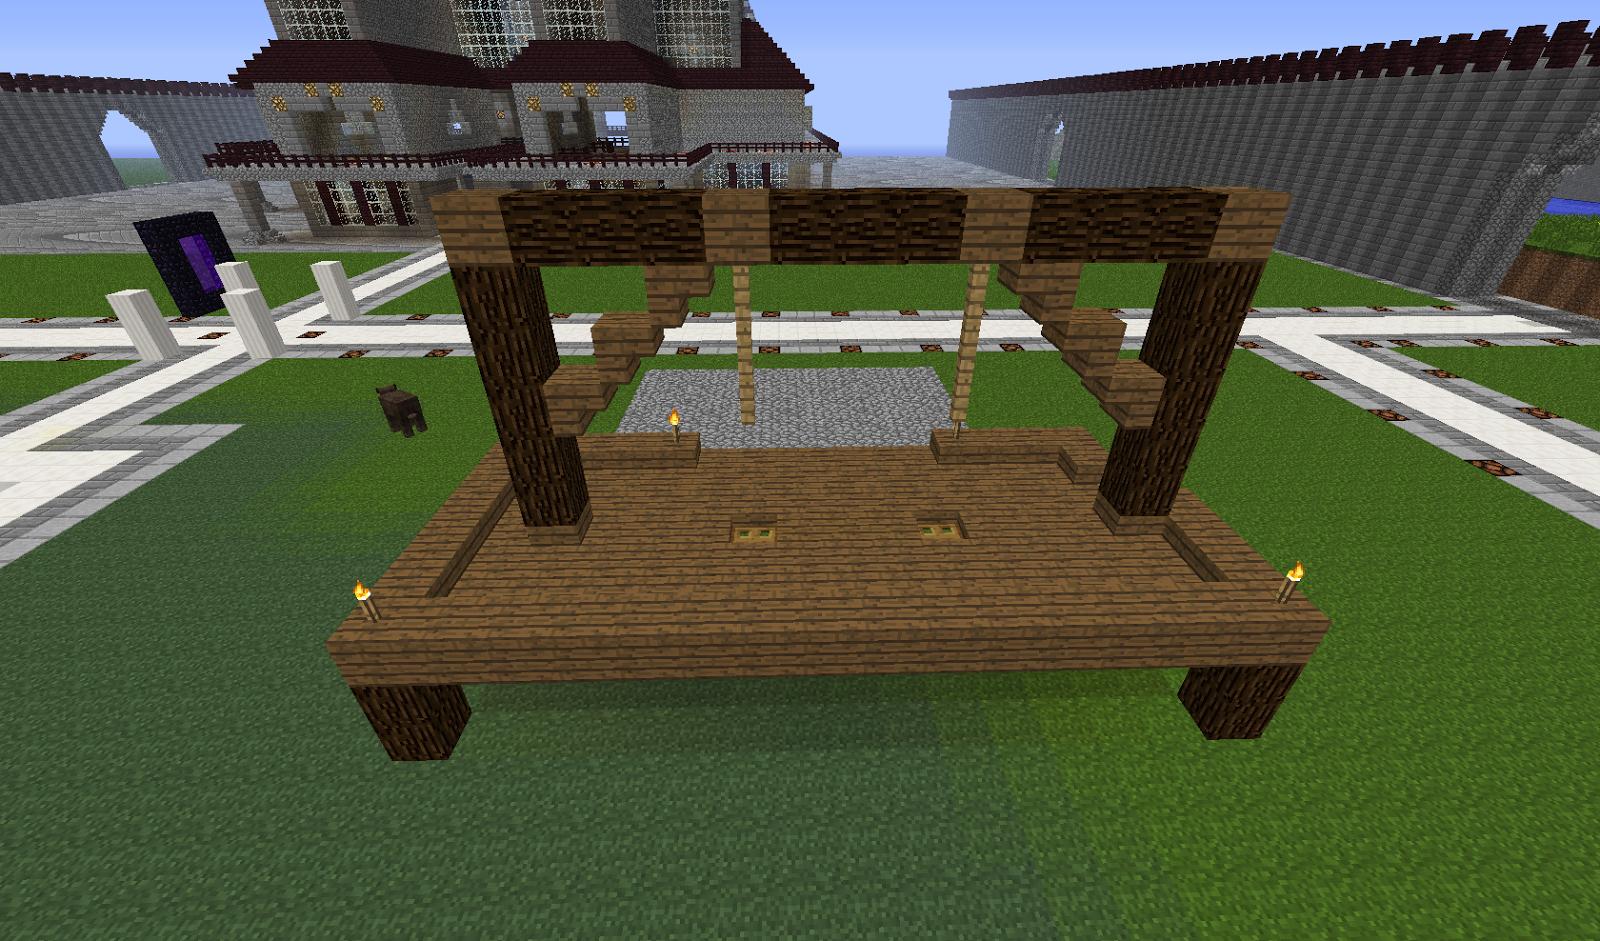 Amazing Minecraft Building Ideas: Gallows